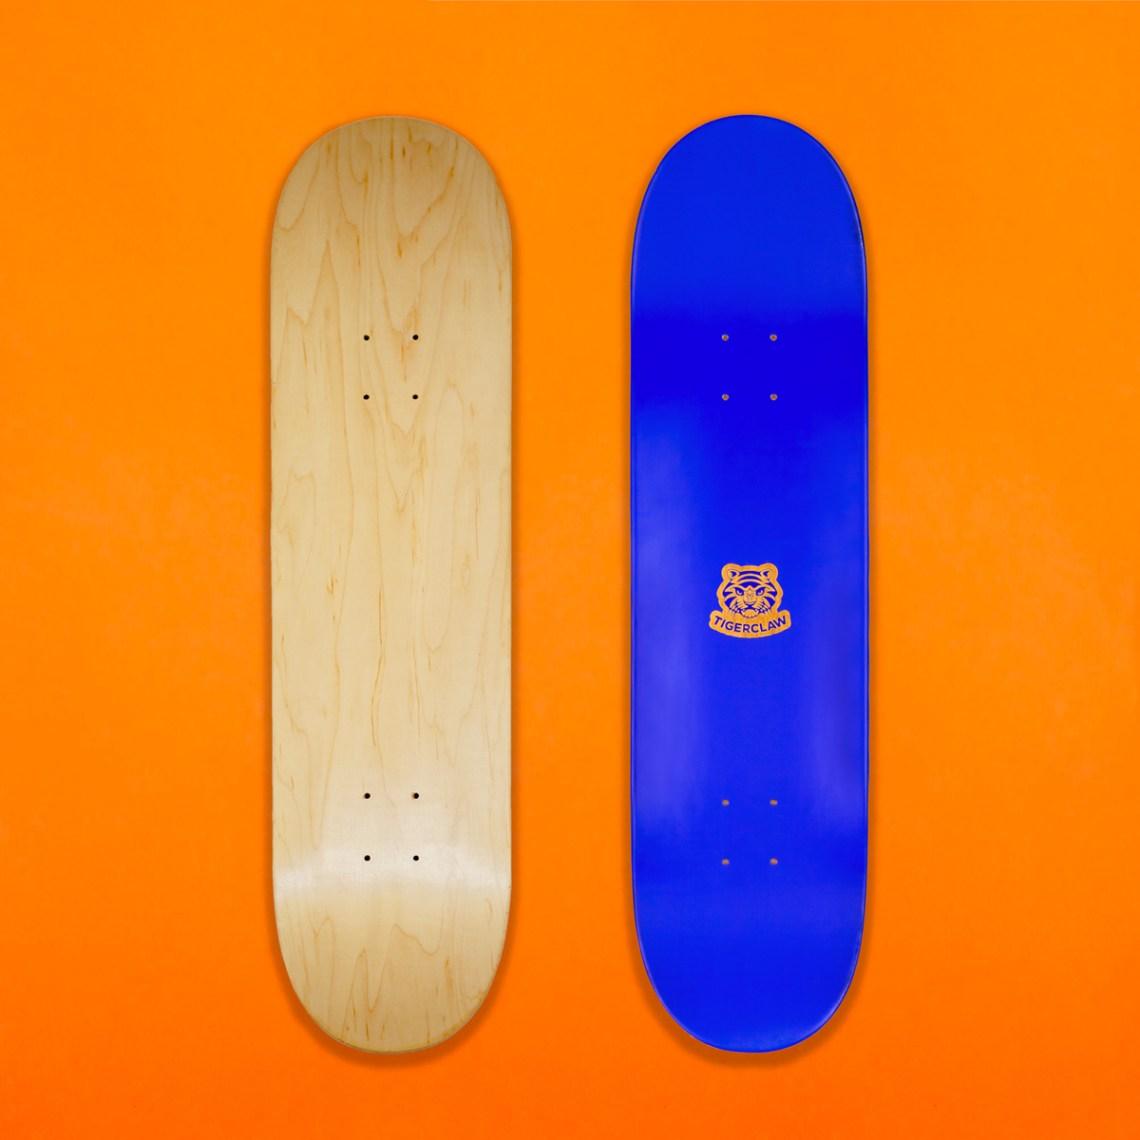 Nude Skateboard Deck By Tigerclaw